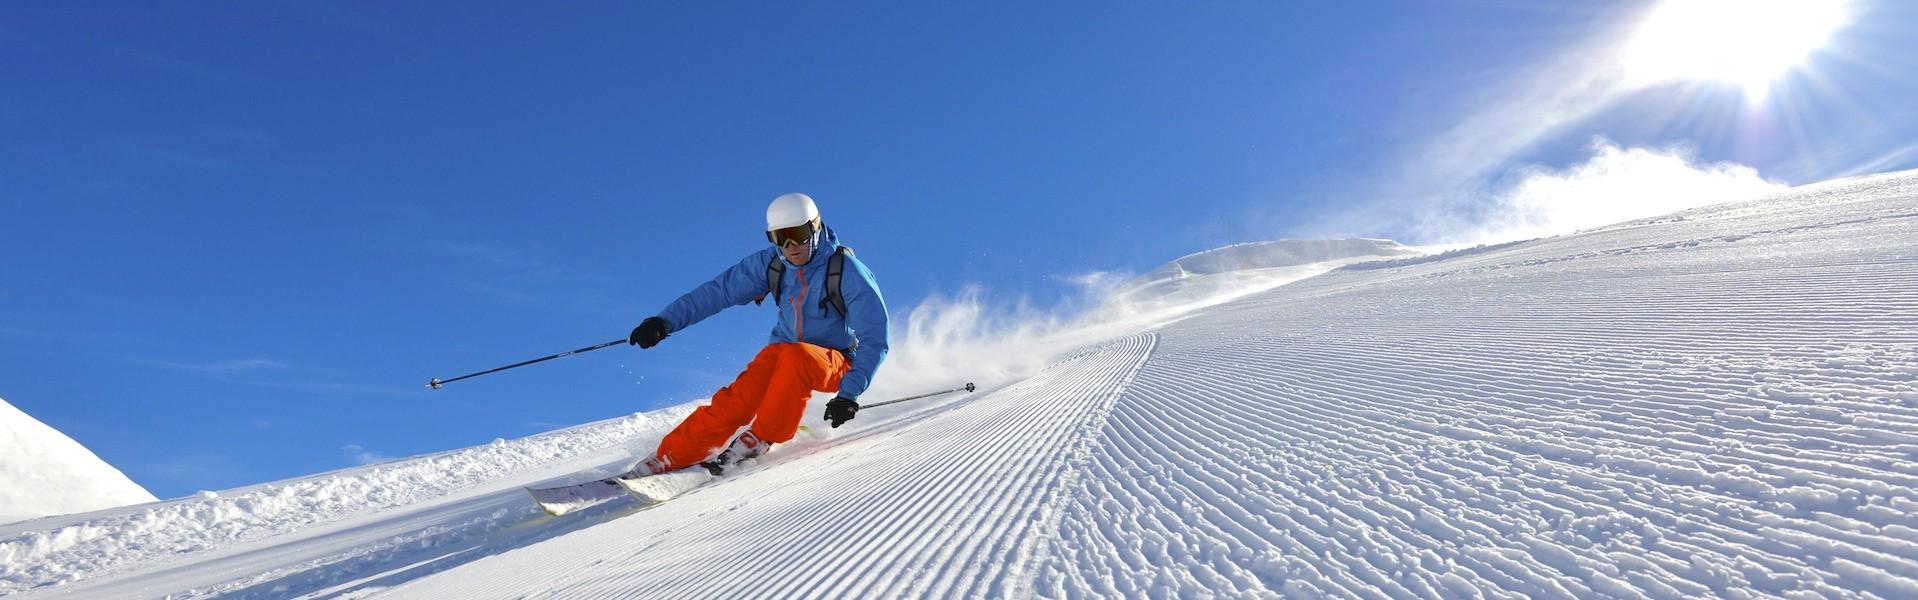 2-ski-david-machet-2801